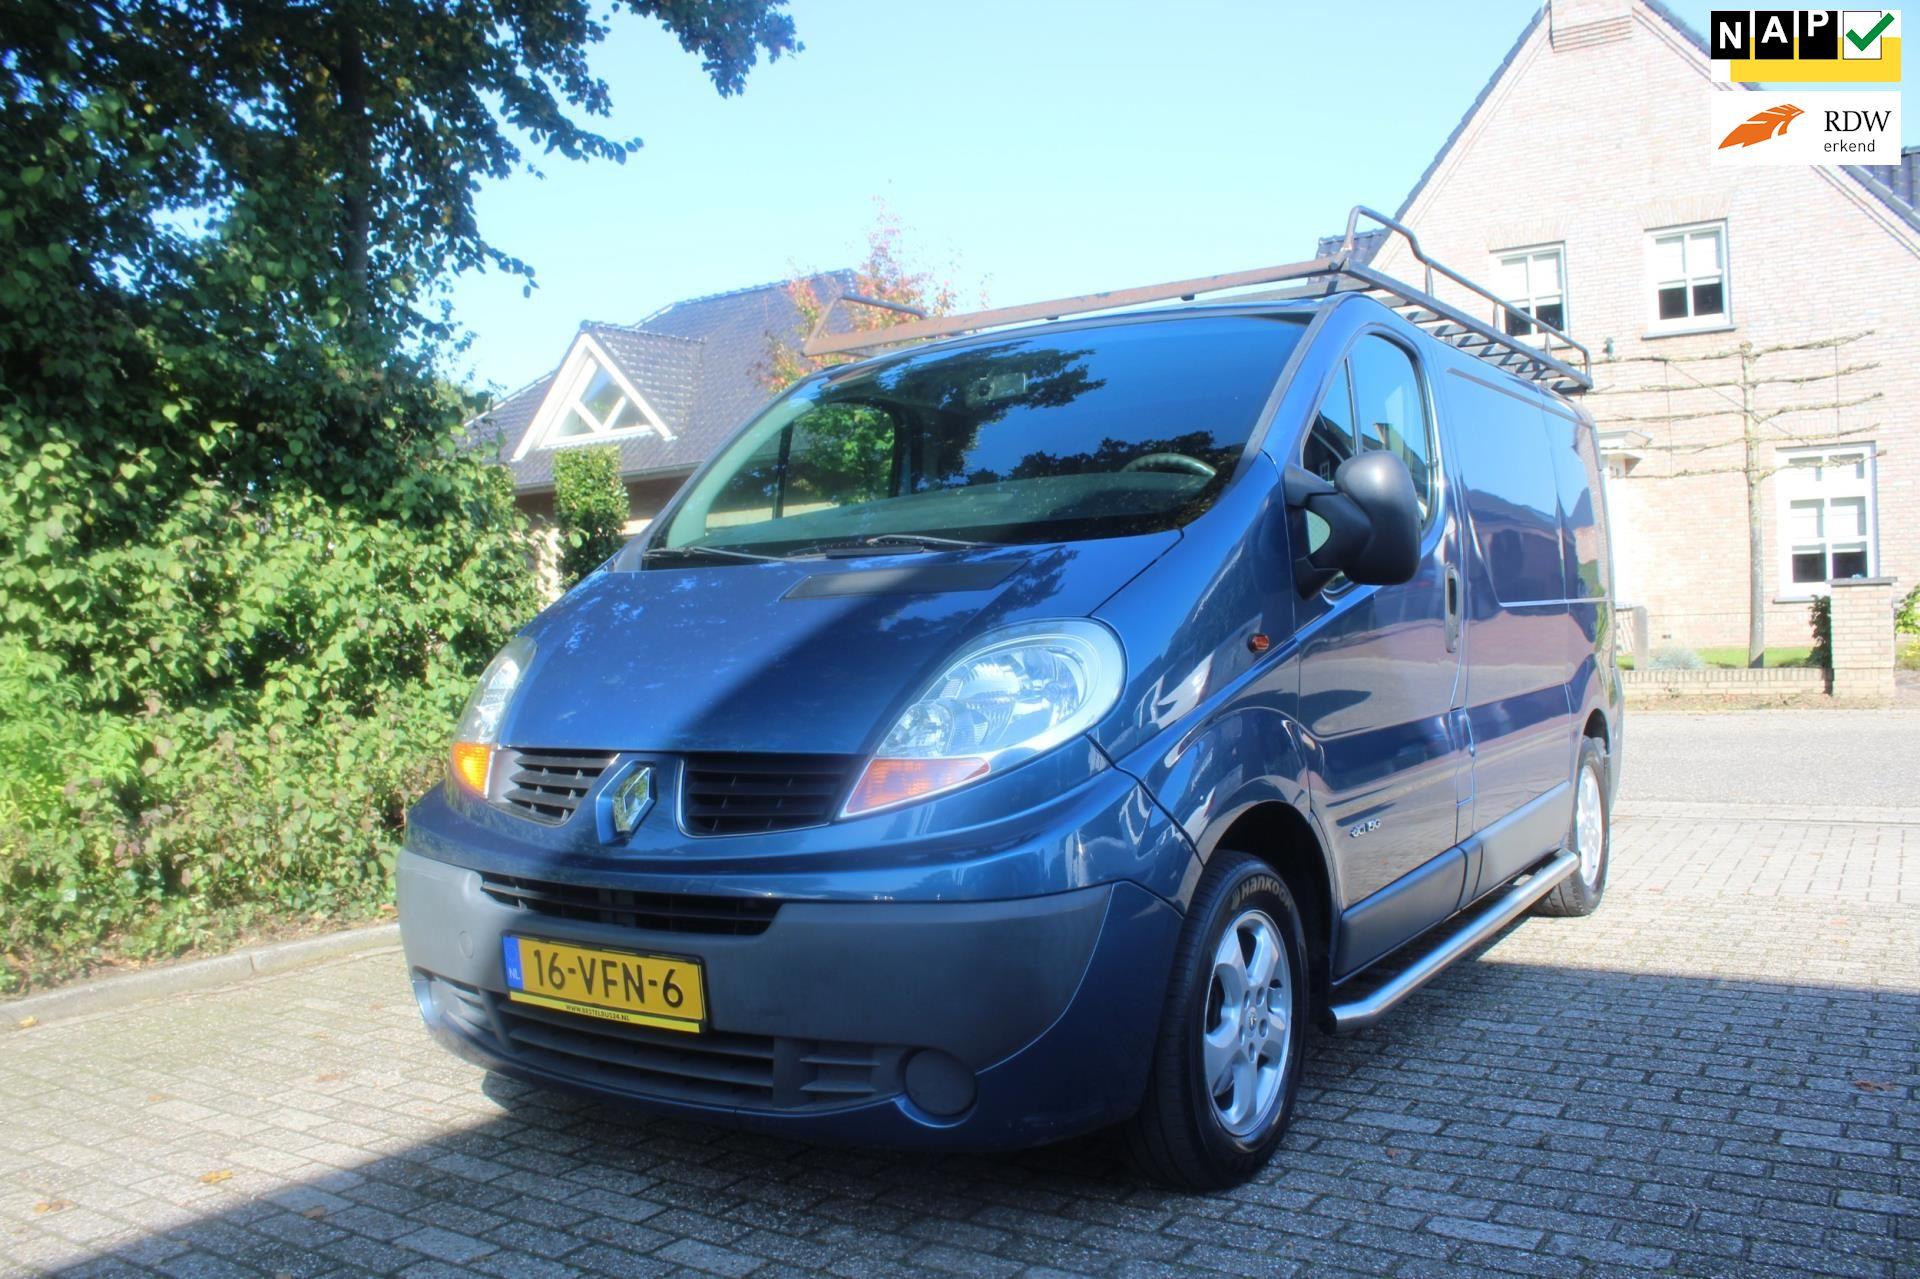 Renault Trafic occasion - Autogroothandel Ammerzoden